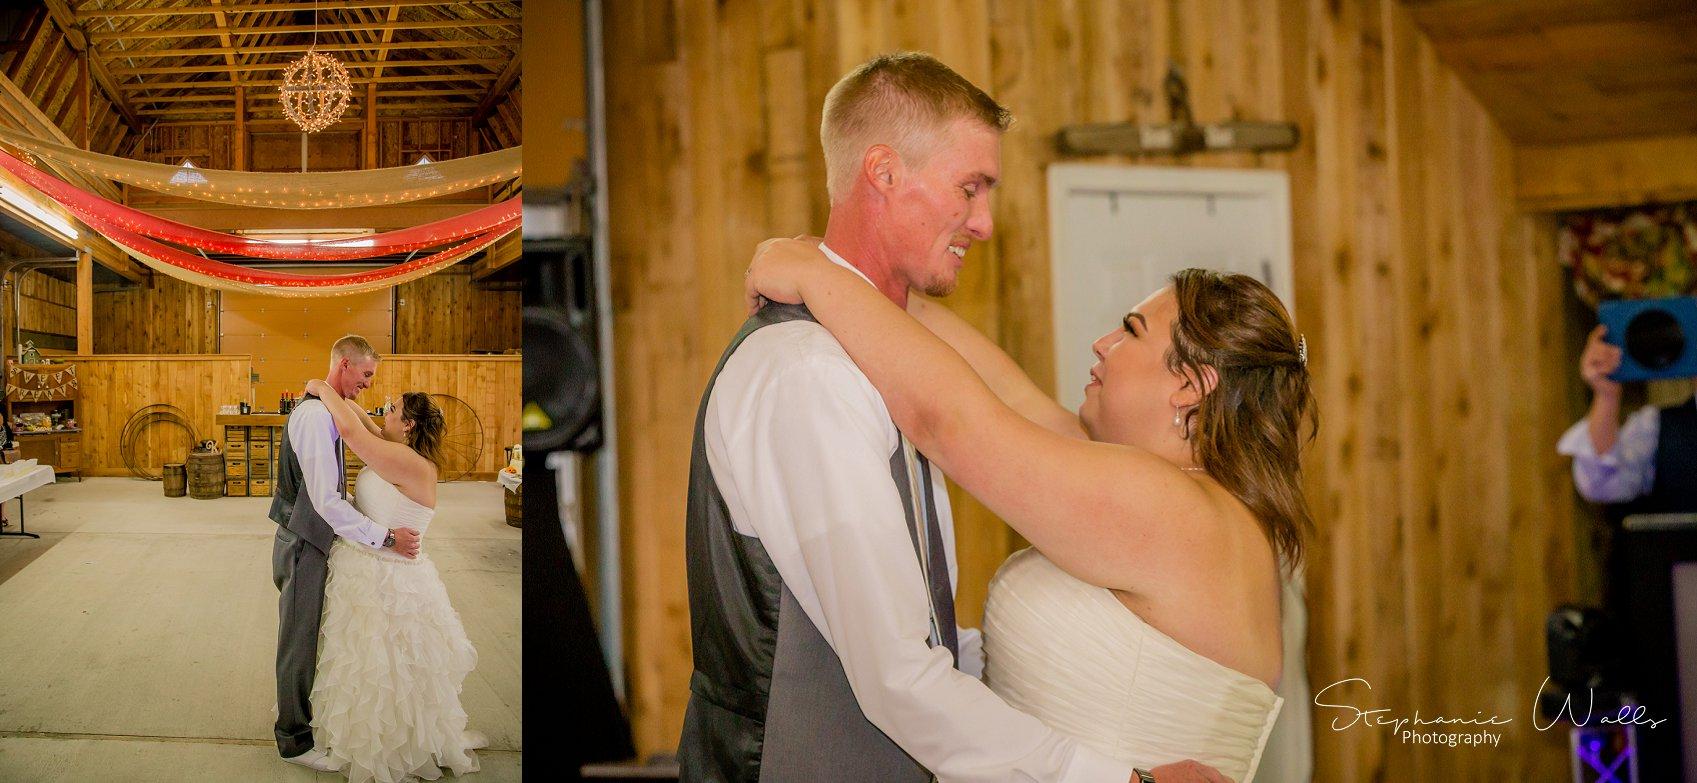 Kimble Wedding 017 1 Marlena & Allans | Snohomish Red Barn Events (Stocker Farms) | Snohomish, Wa Wedding Photographer